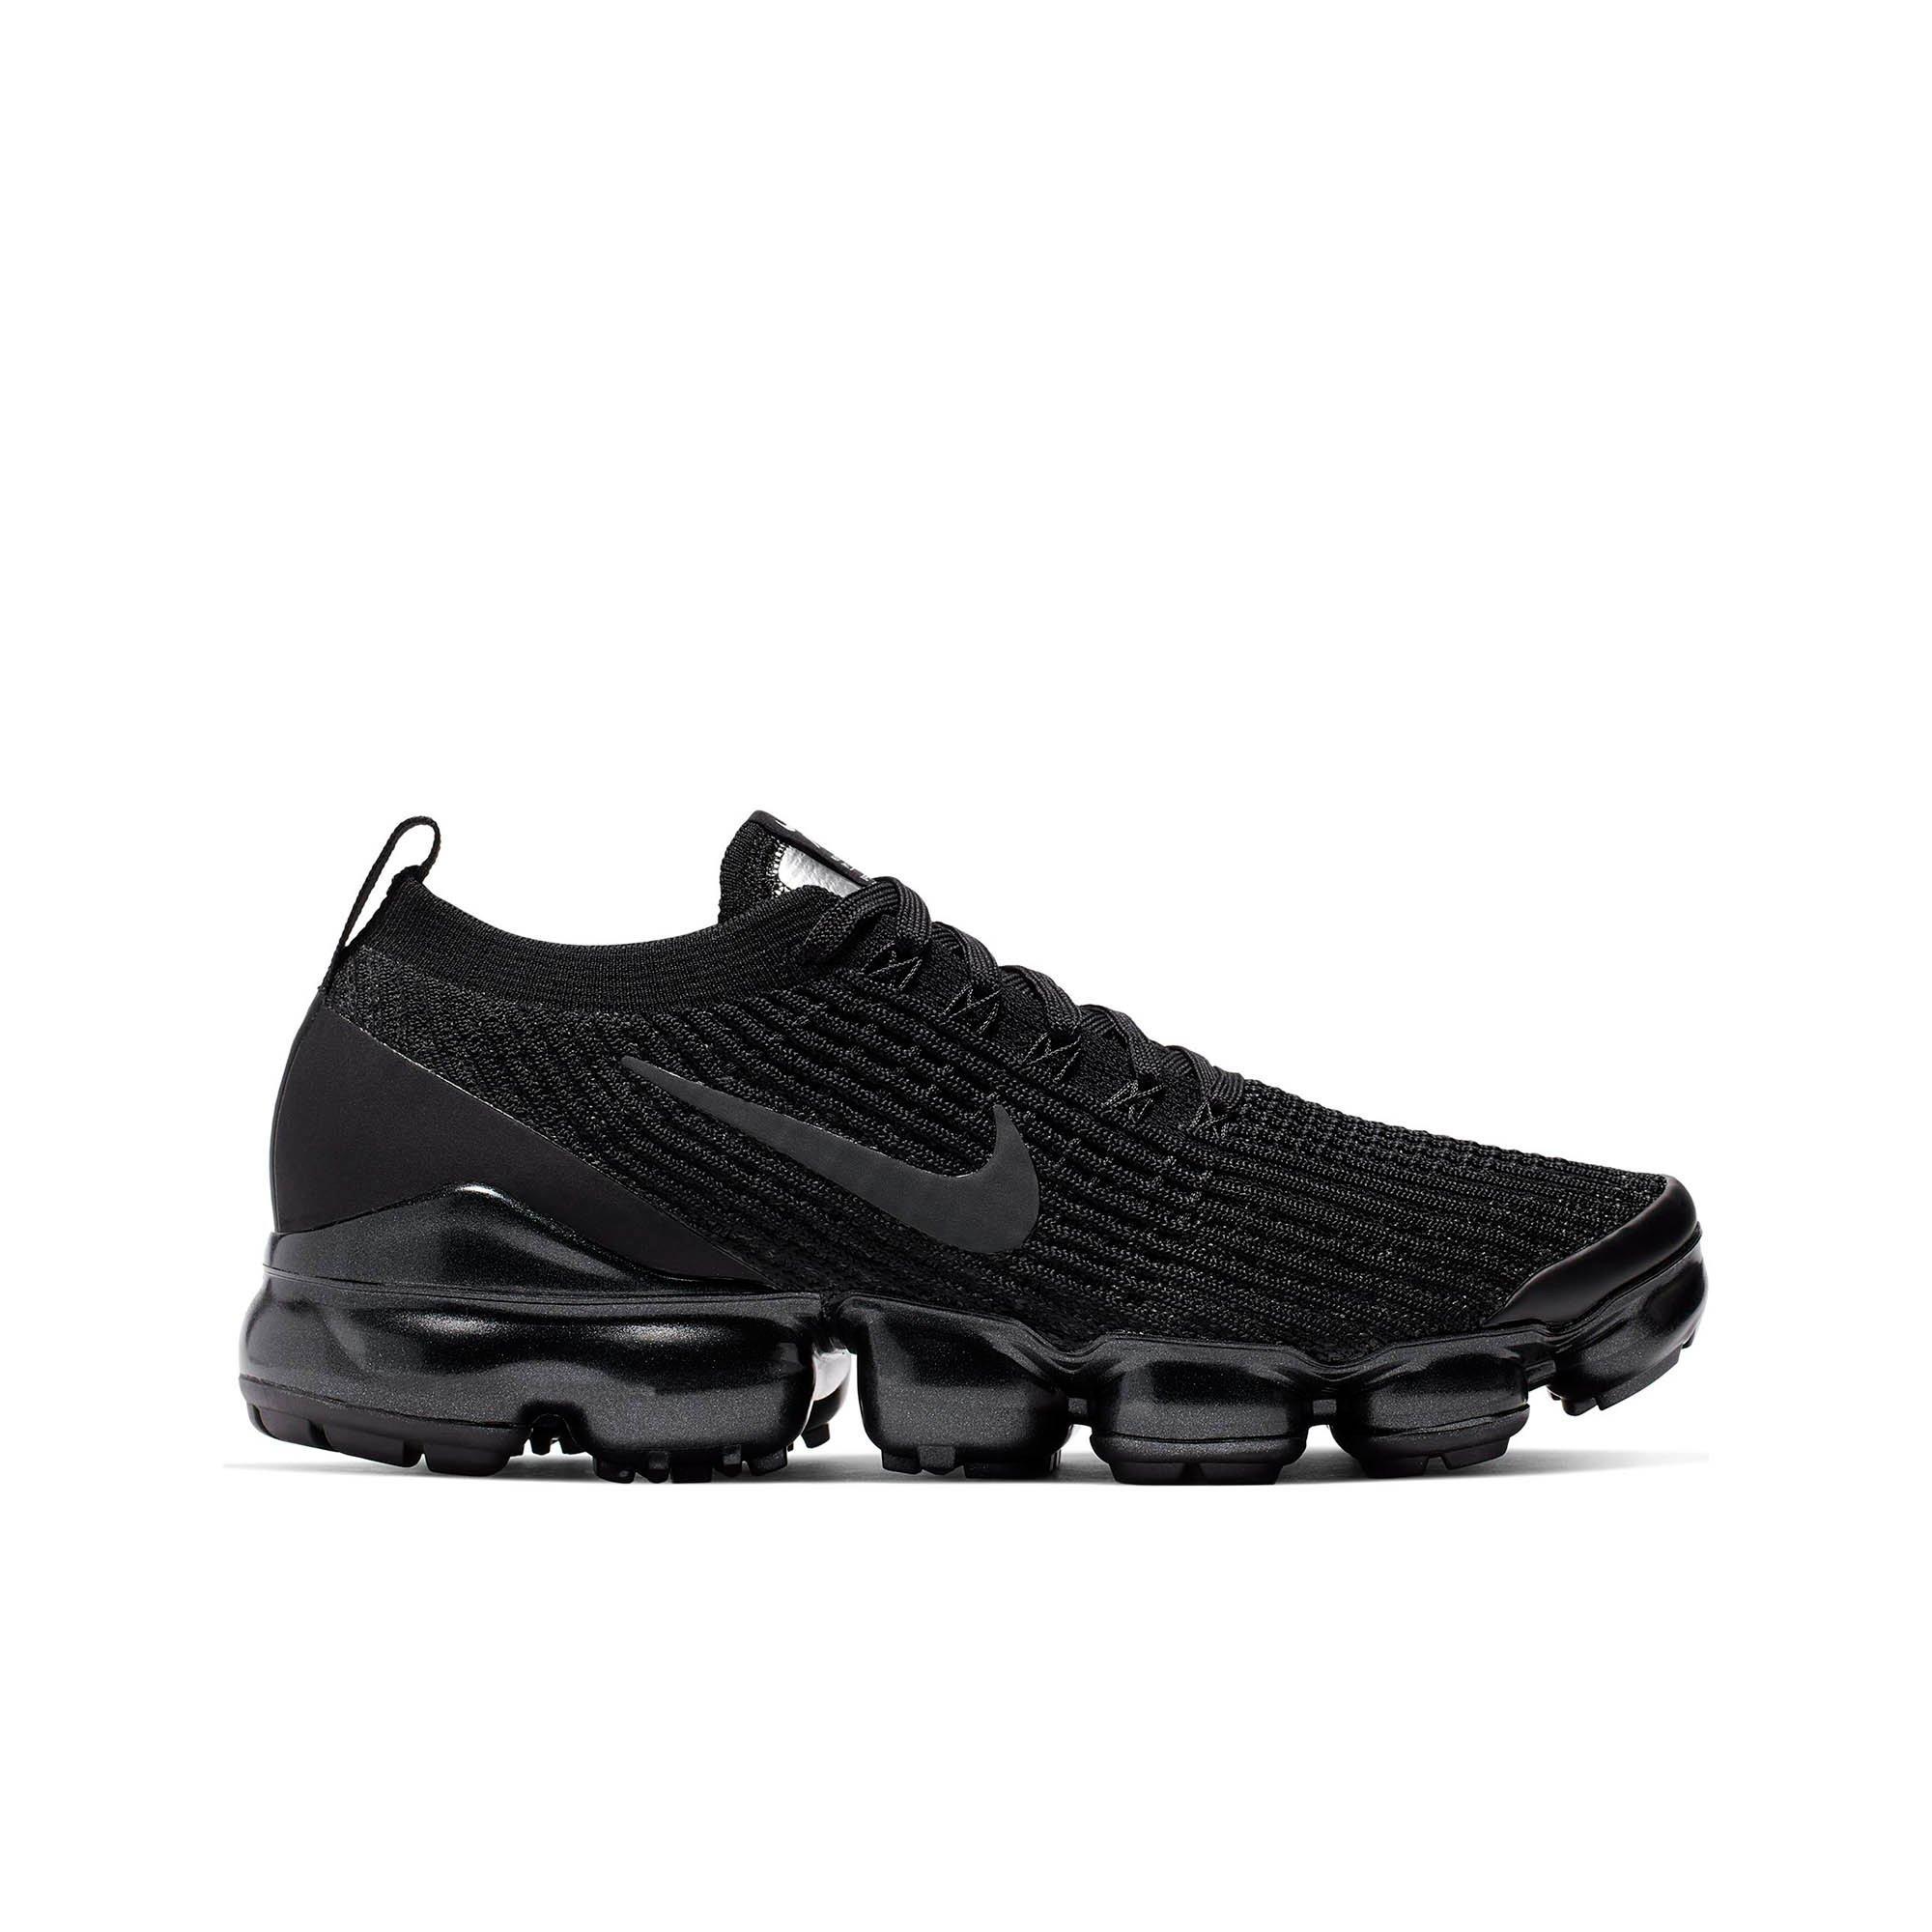 mizuno shoe size compared to nike air max